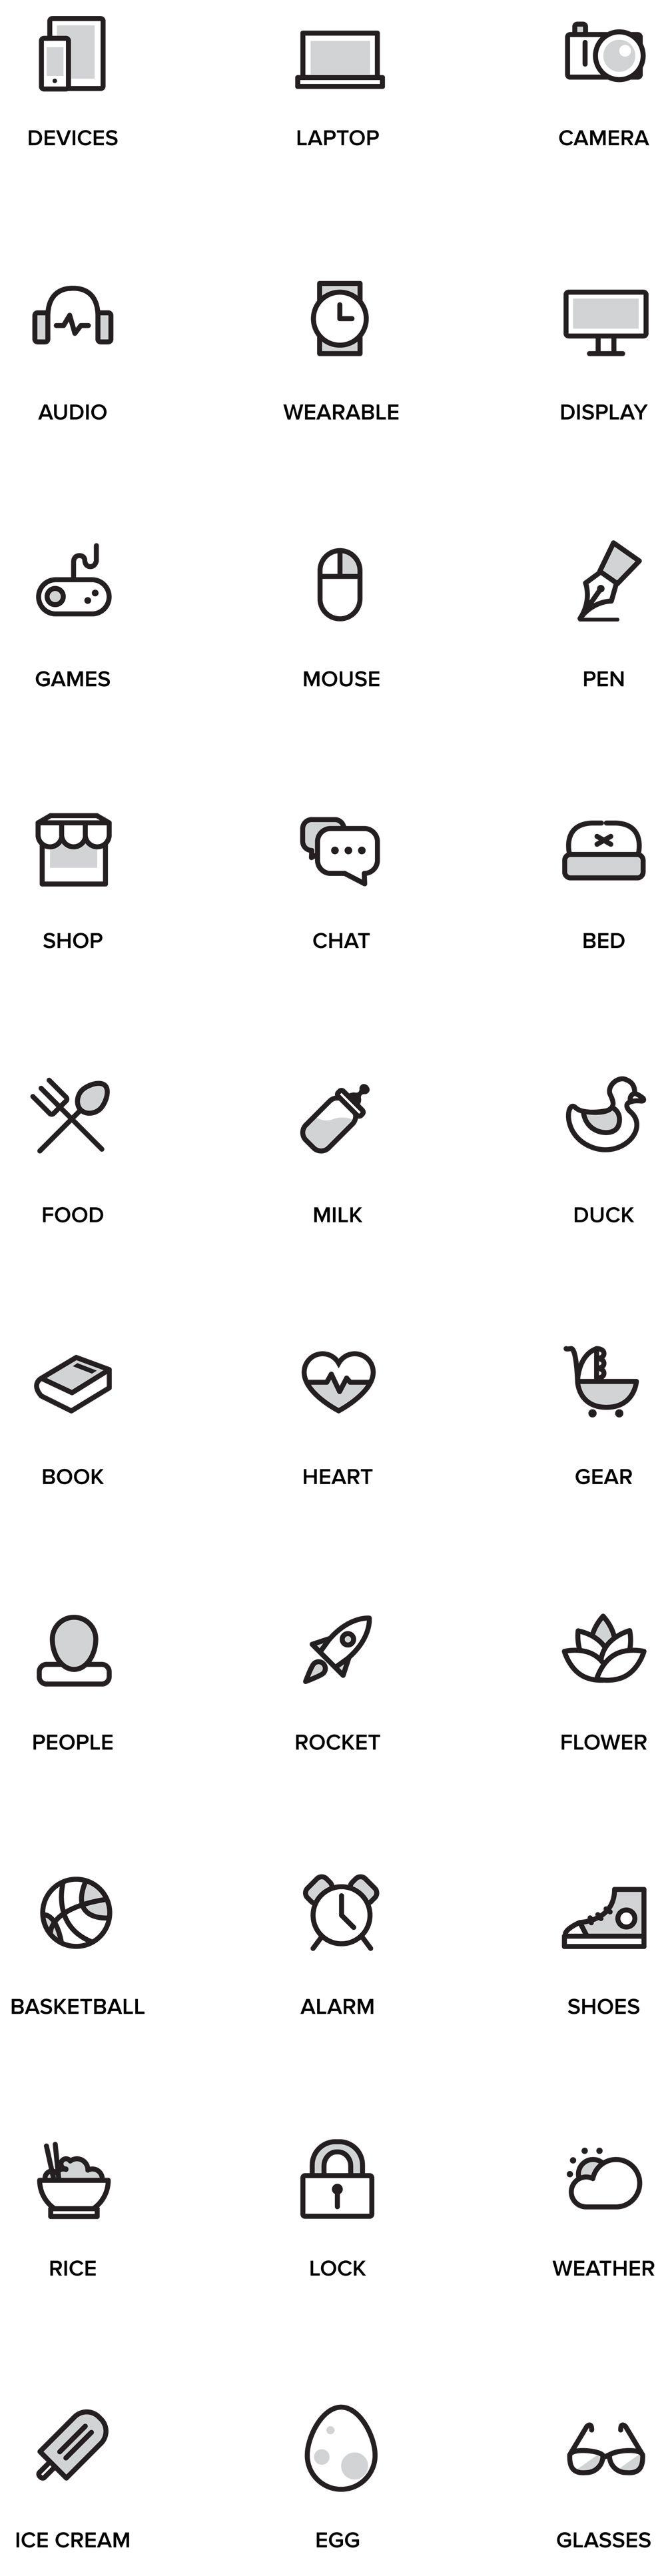 Random Stuff Free Iconset, #AI, #Free, #Graphic #Design, #Icon, #Outline, #Resource, #Vector